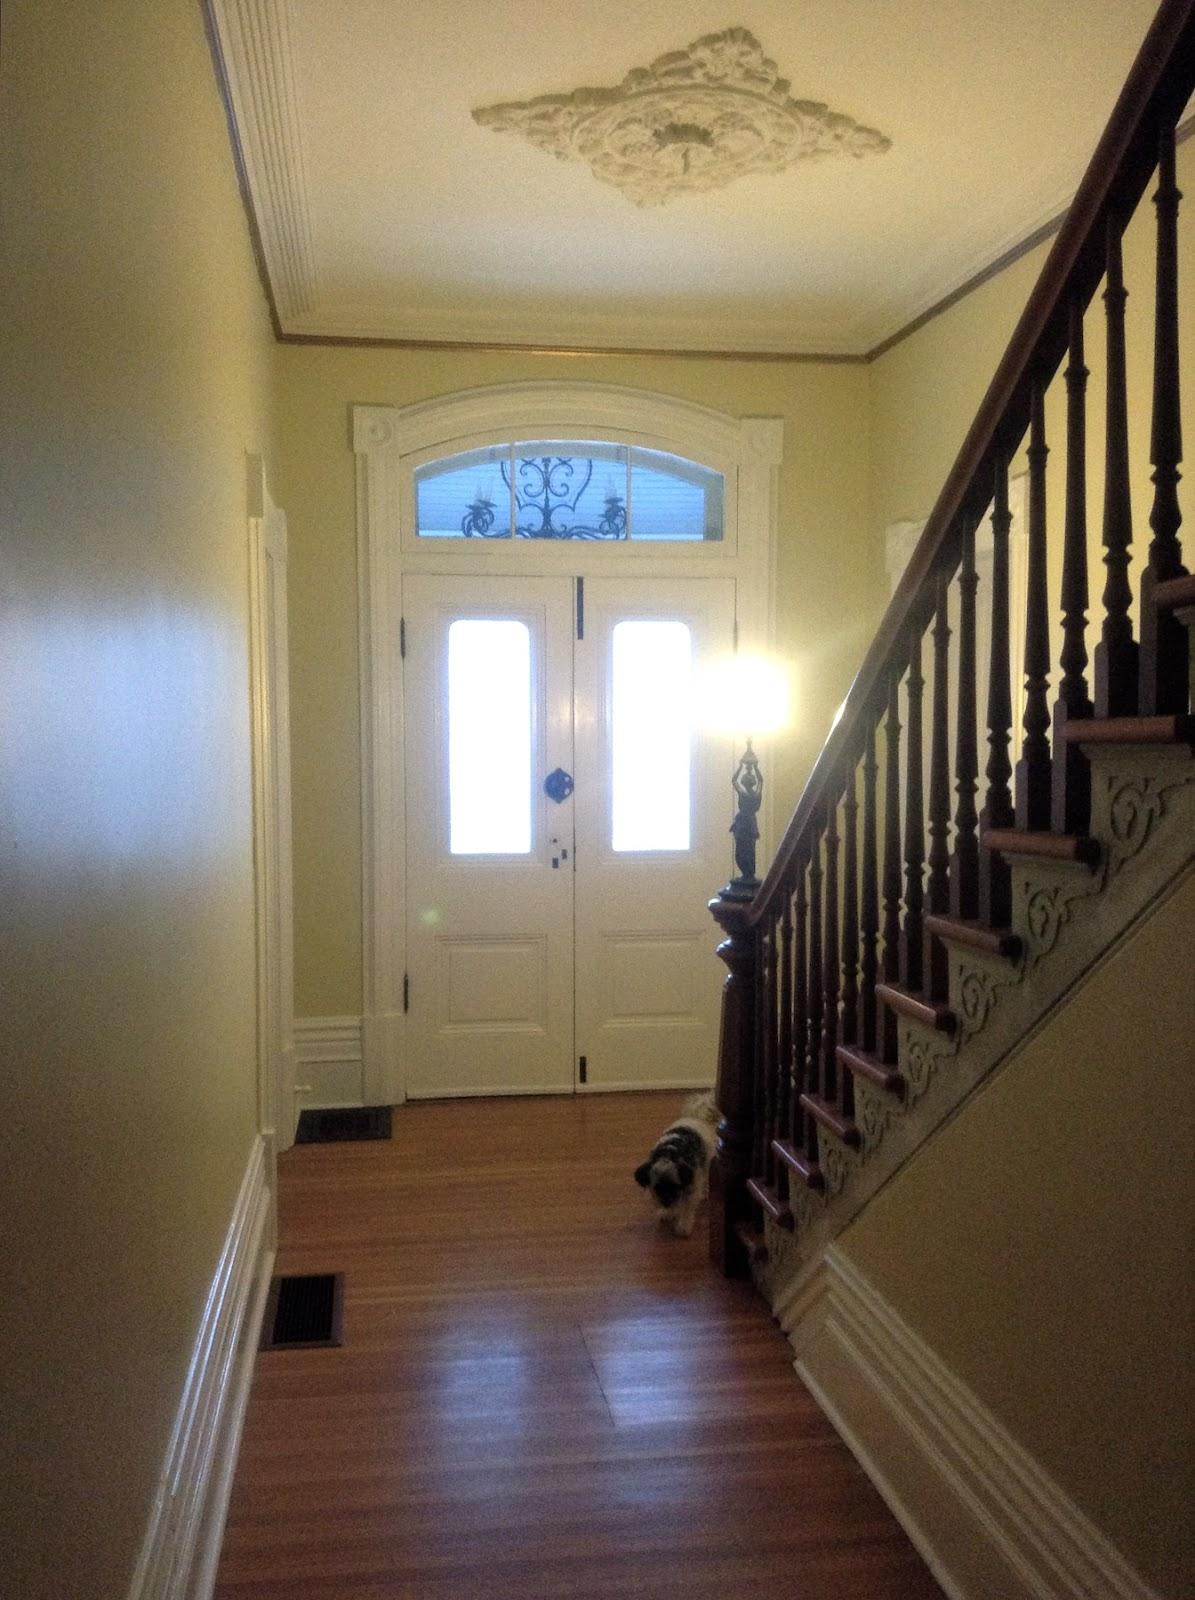 Painting Hallways Extraordinary Of Hallway Painting Photo